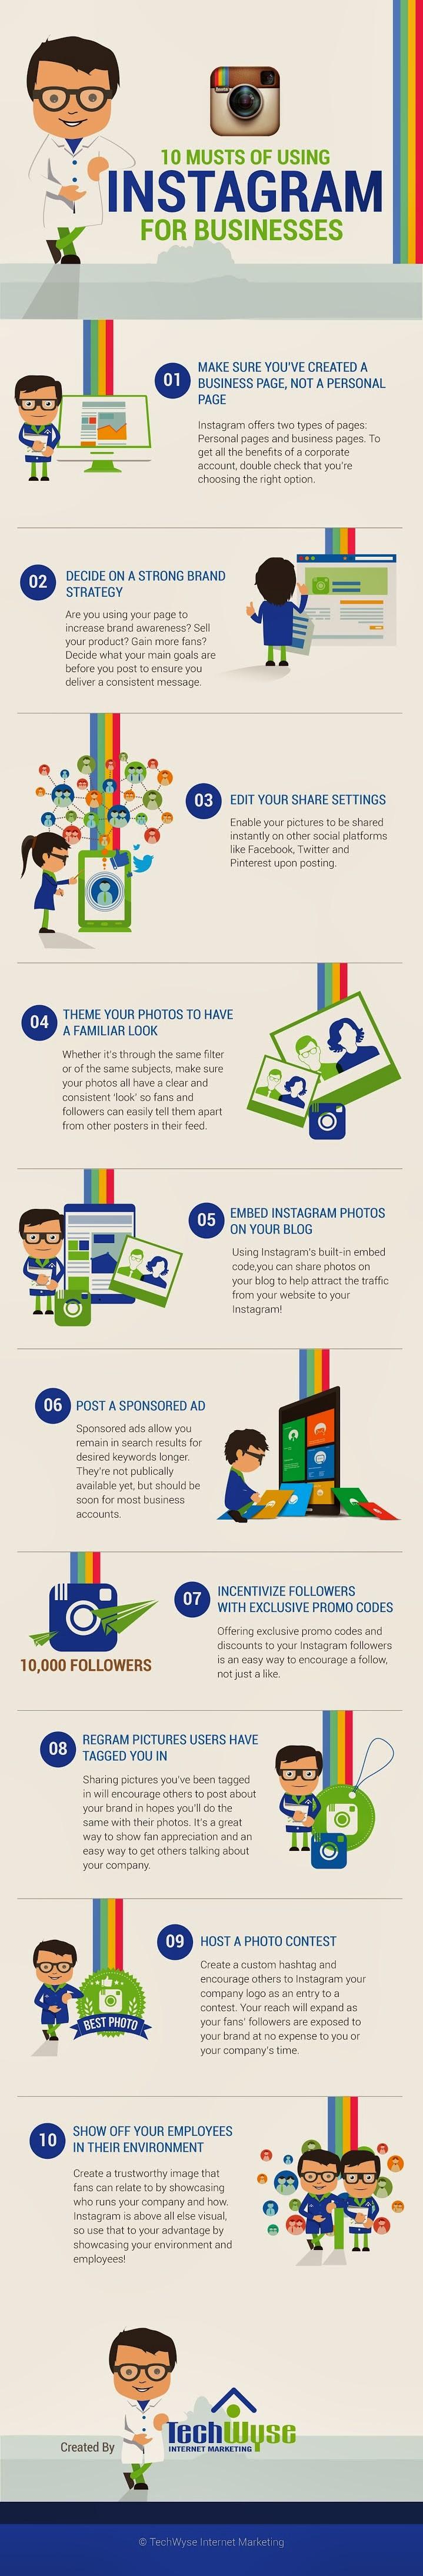 10 razones para usar Instagram para empresas